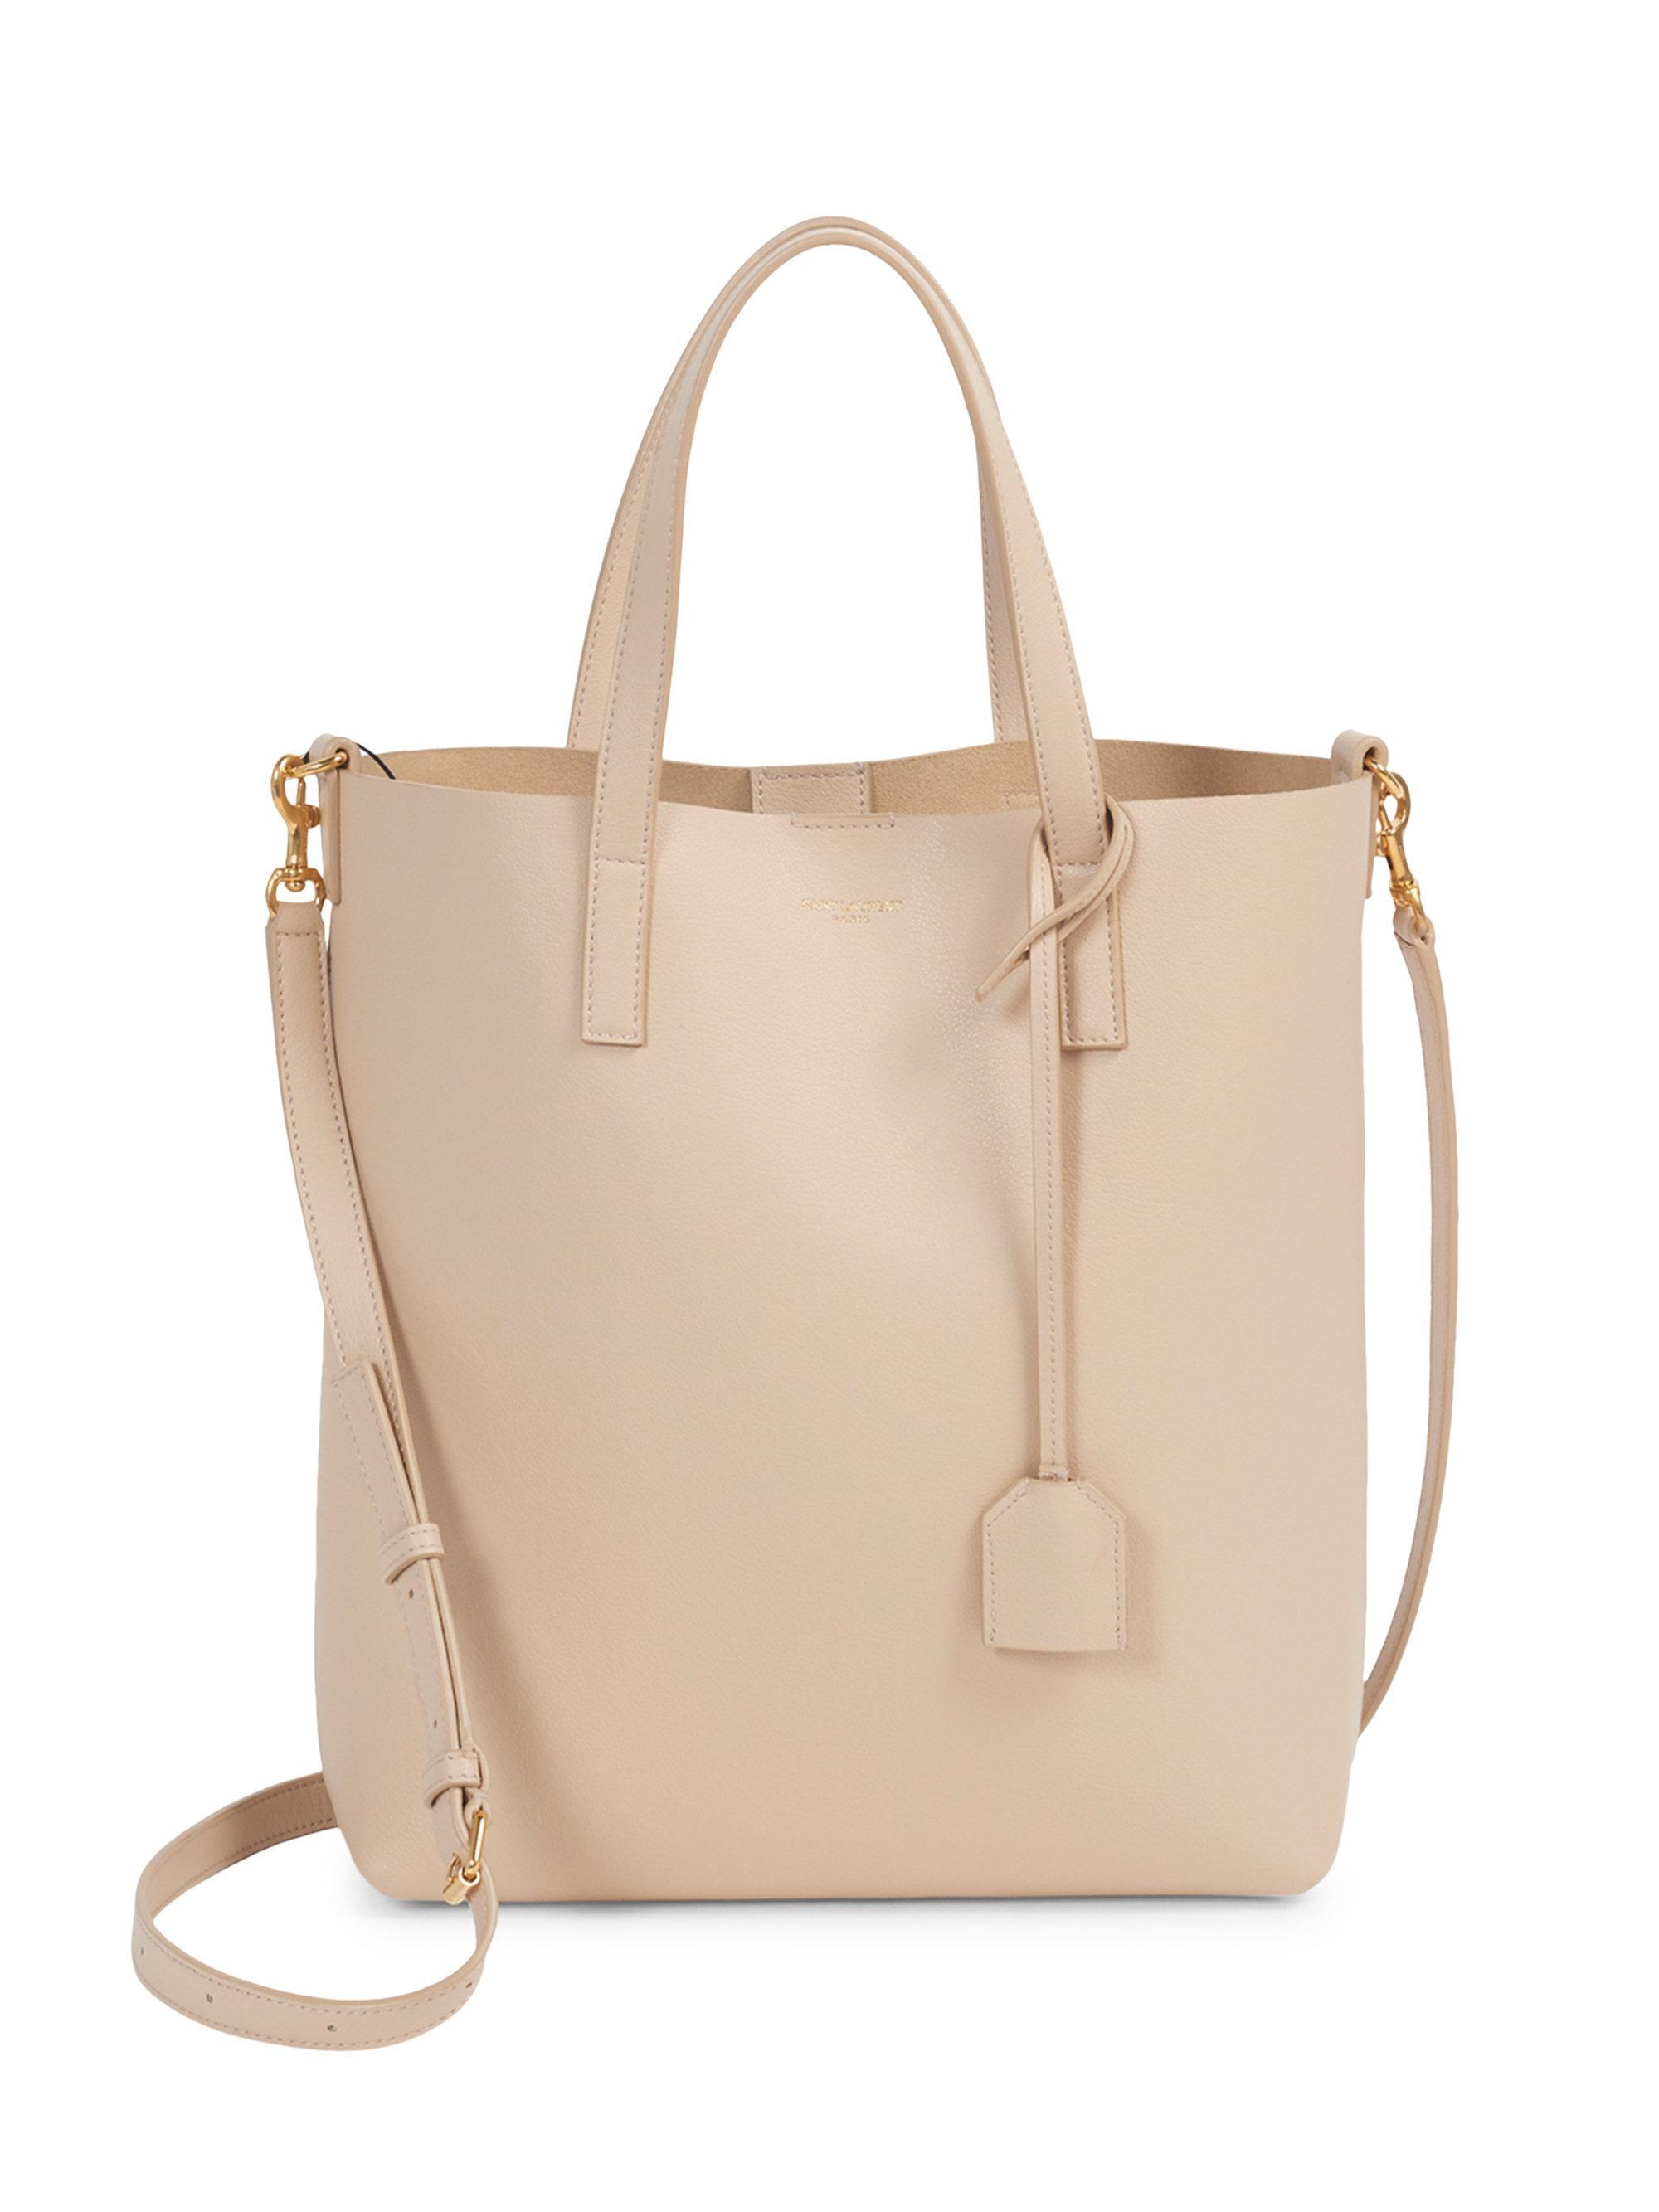 61b4562d97374 Saint Laurent Small Crossbody Shopper Bag in Natural - Lyst